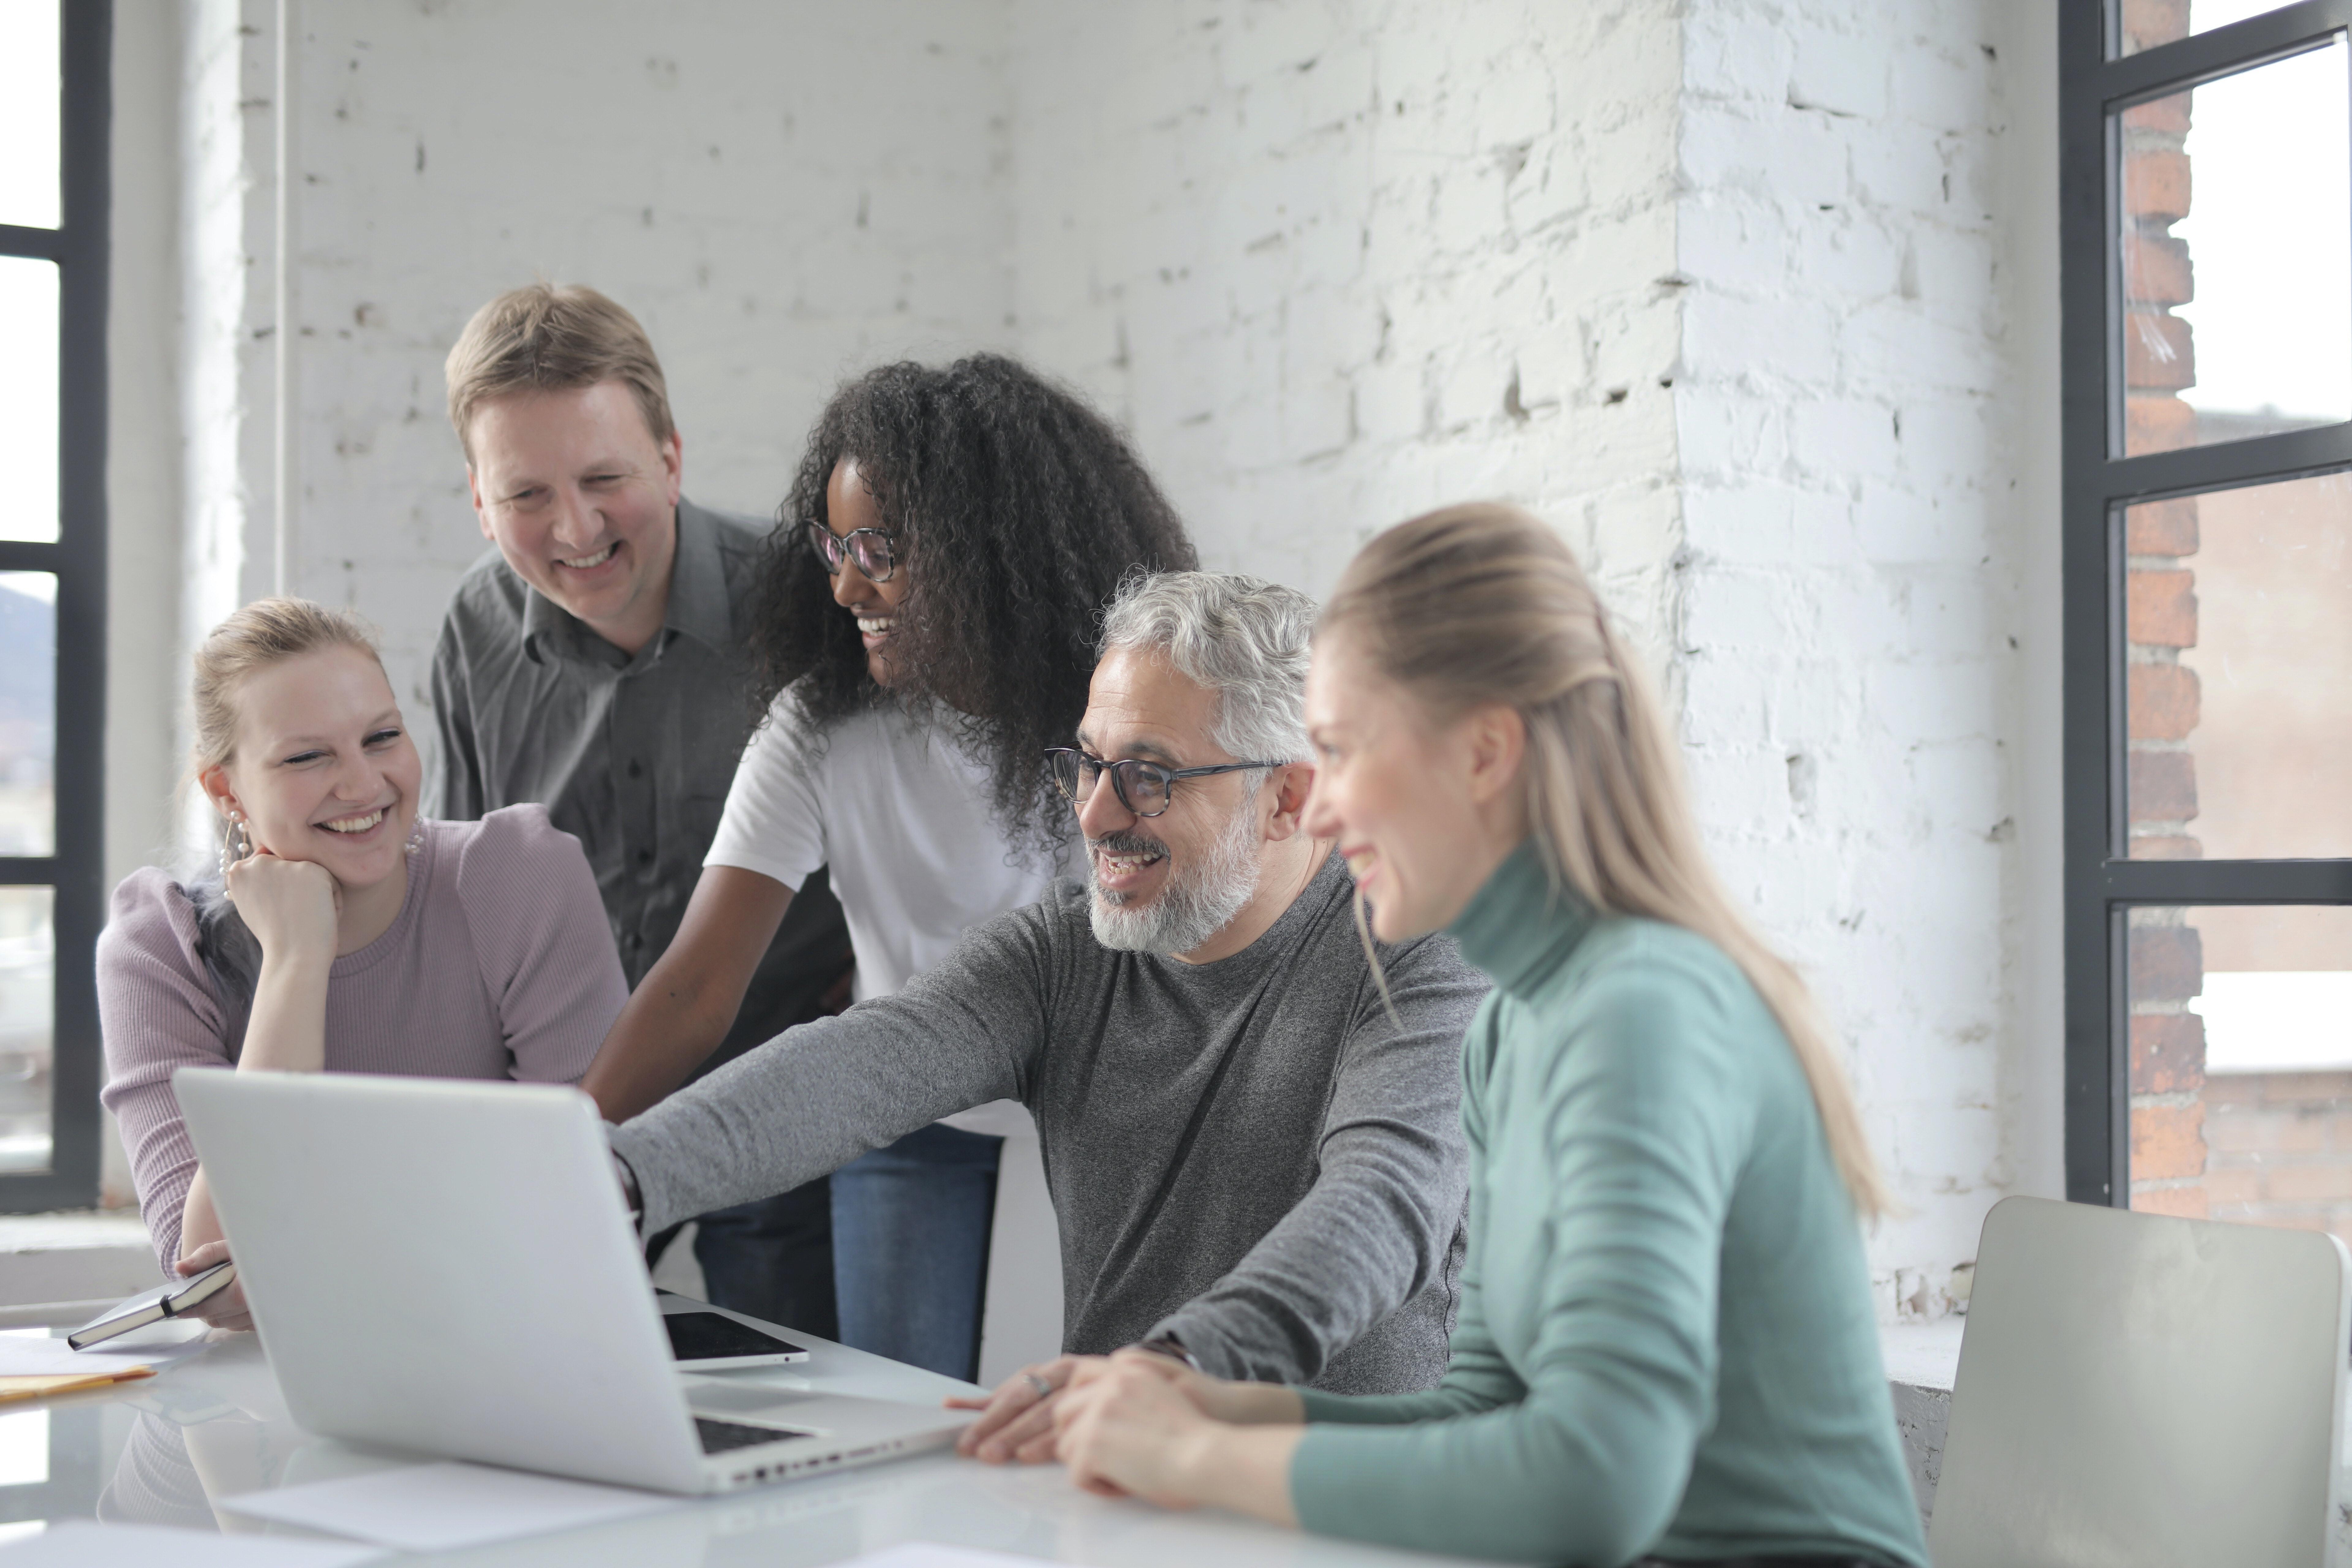 5 Employee Retention Ideas To Reduce Turnover